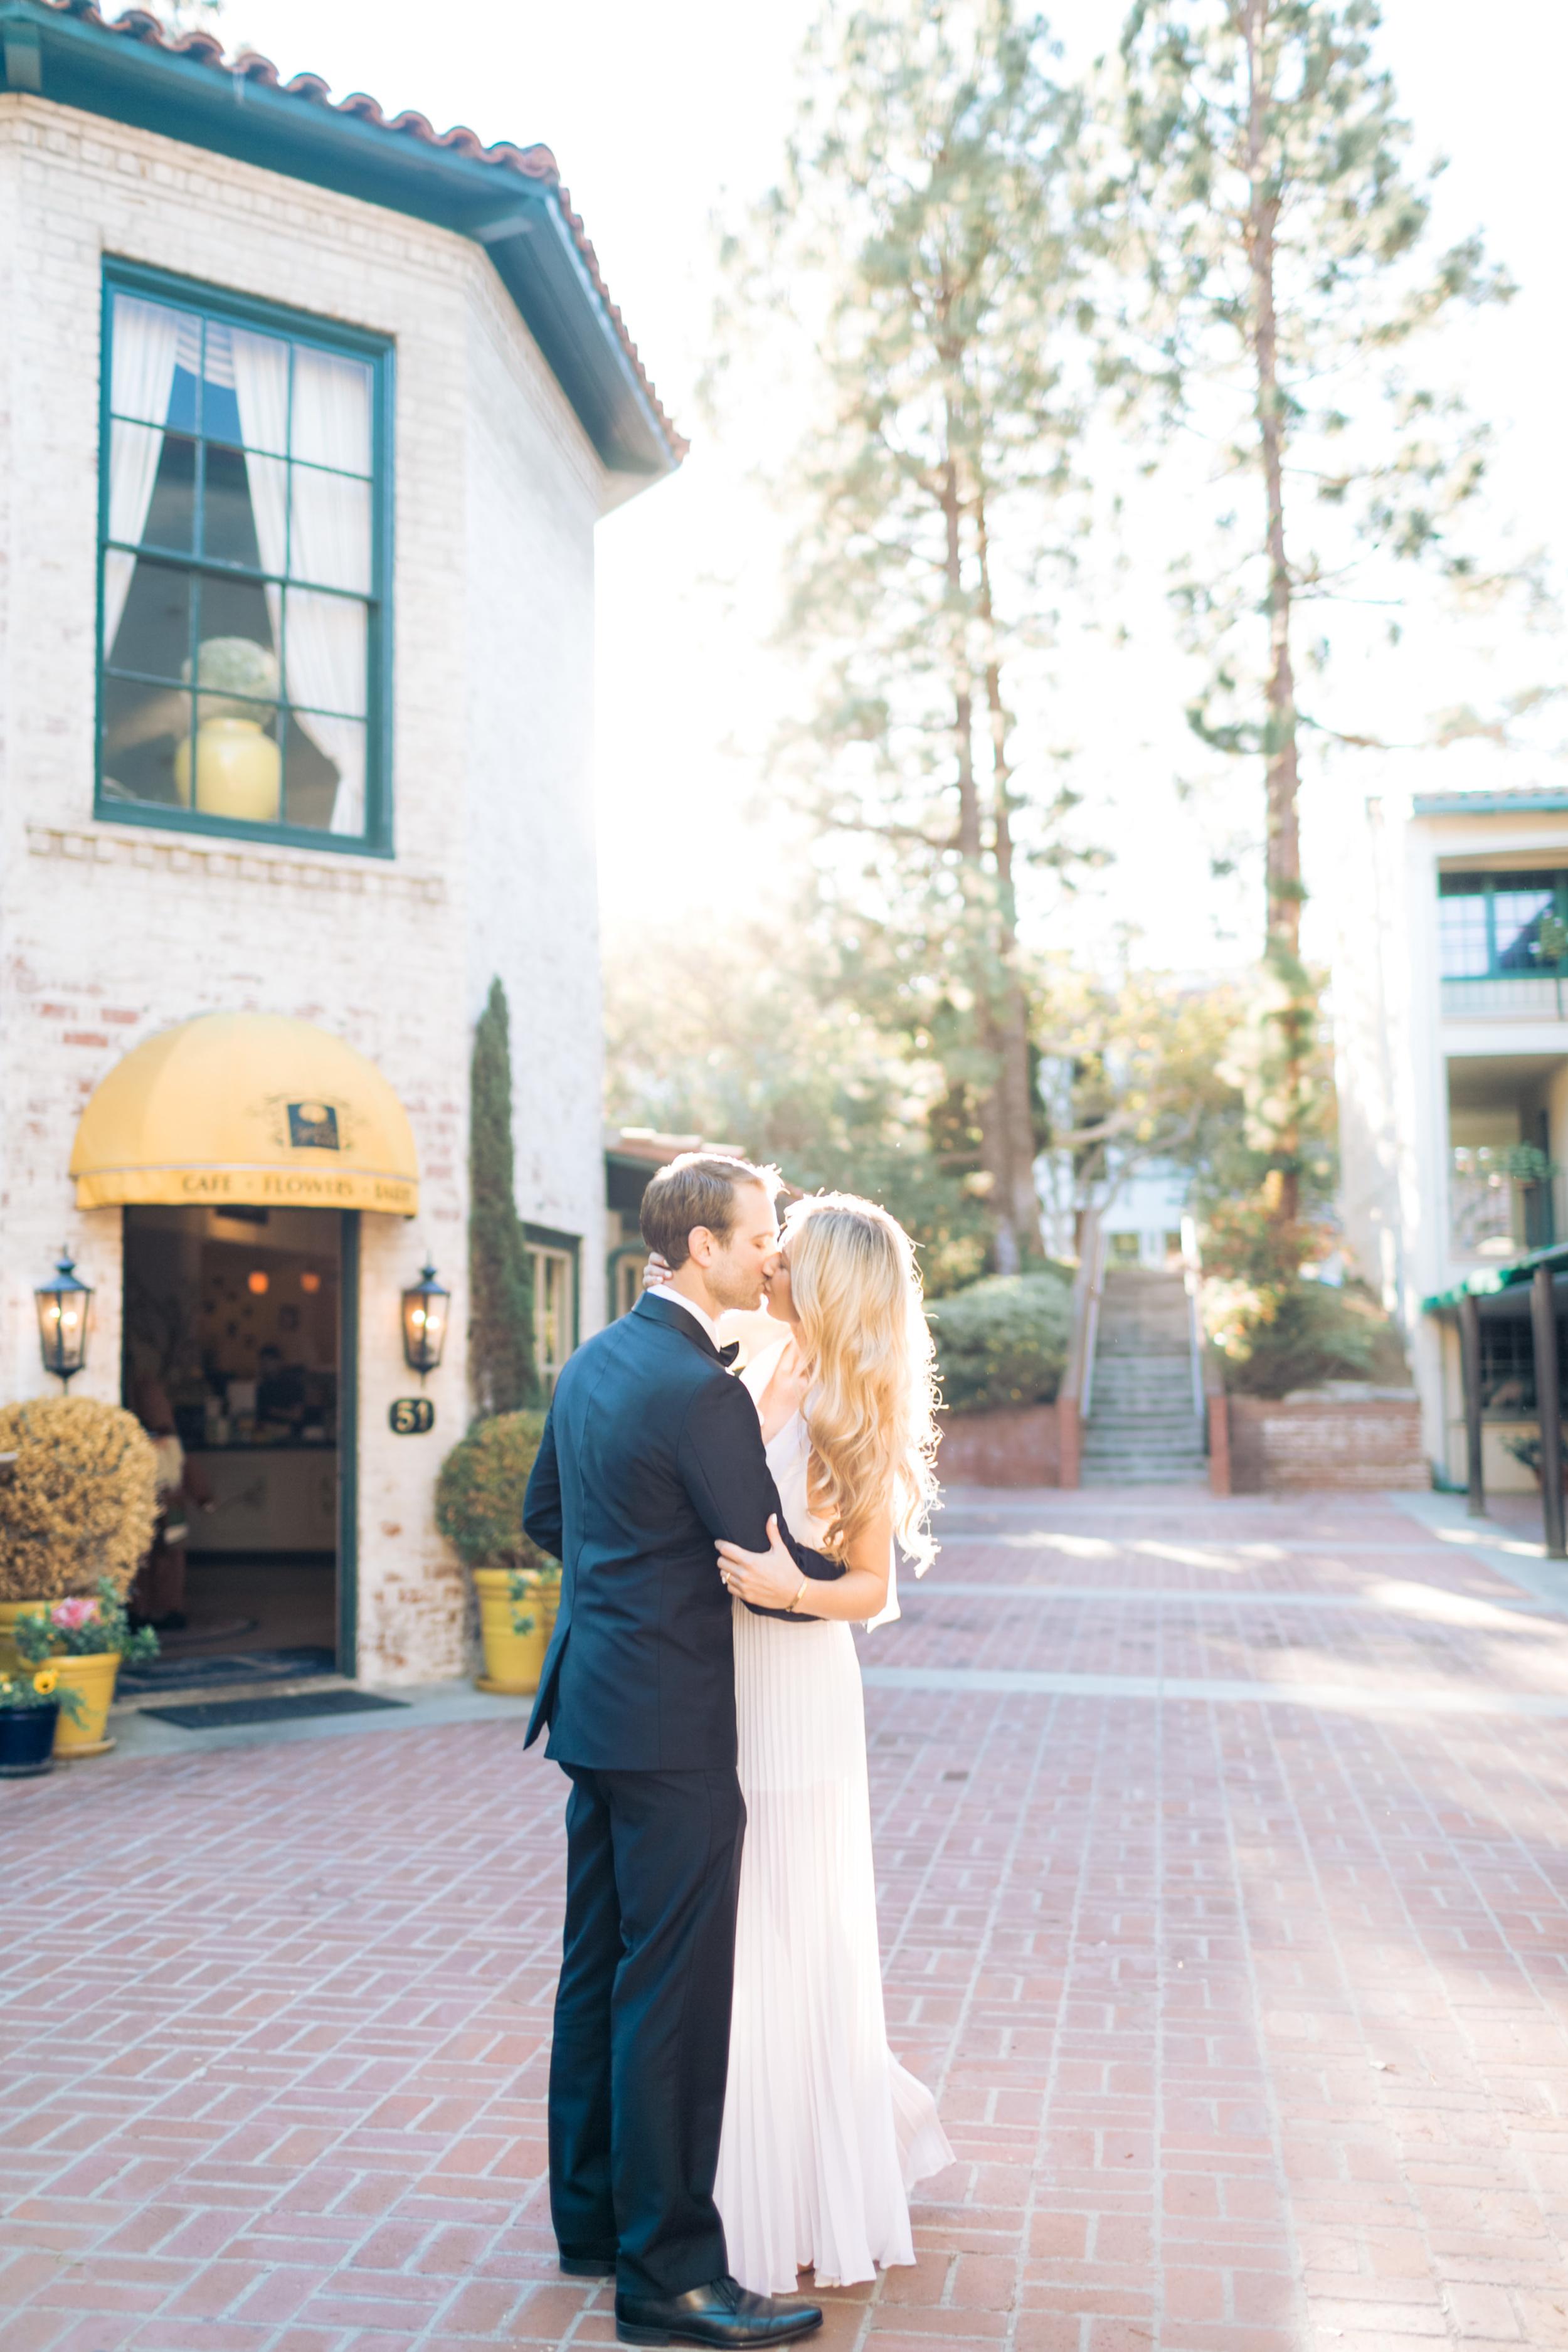 2015Natalie Schutt Photography- Palos Verdes Wedding-37.JPG